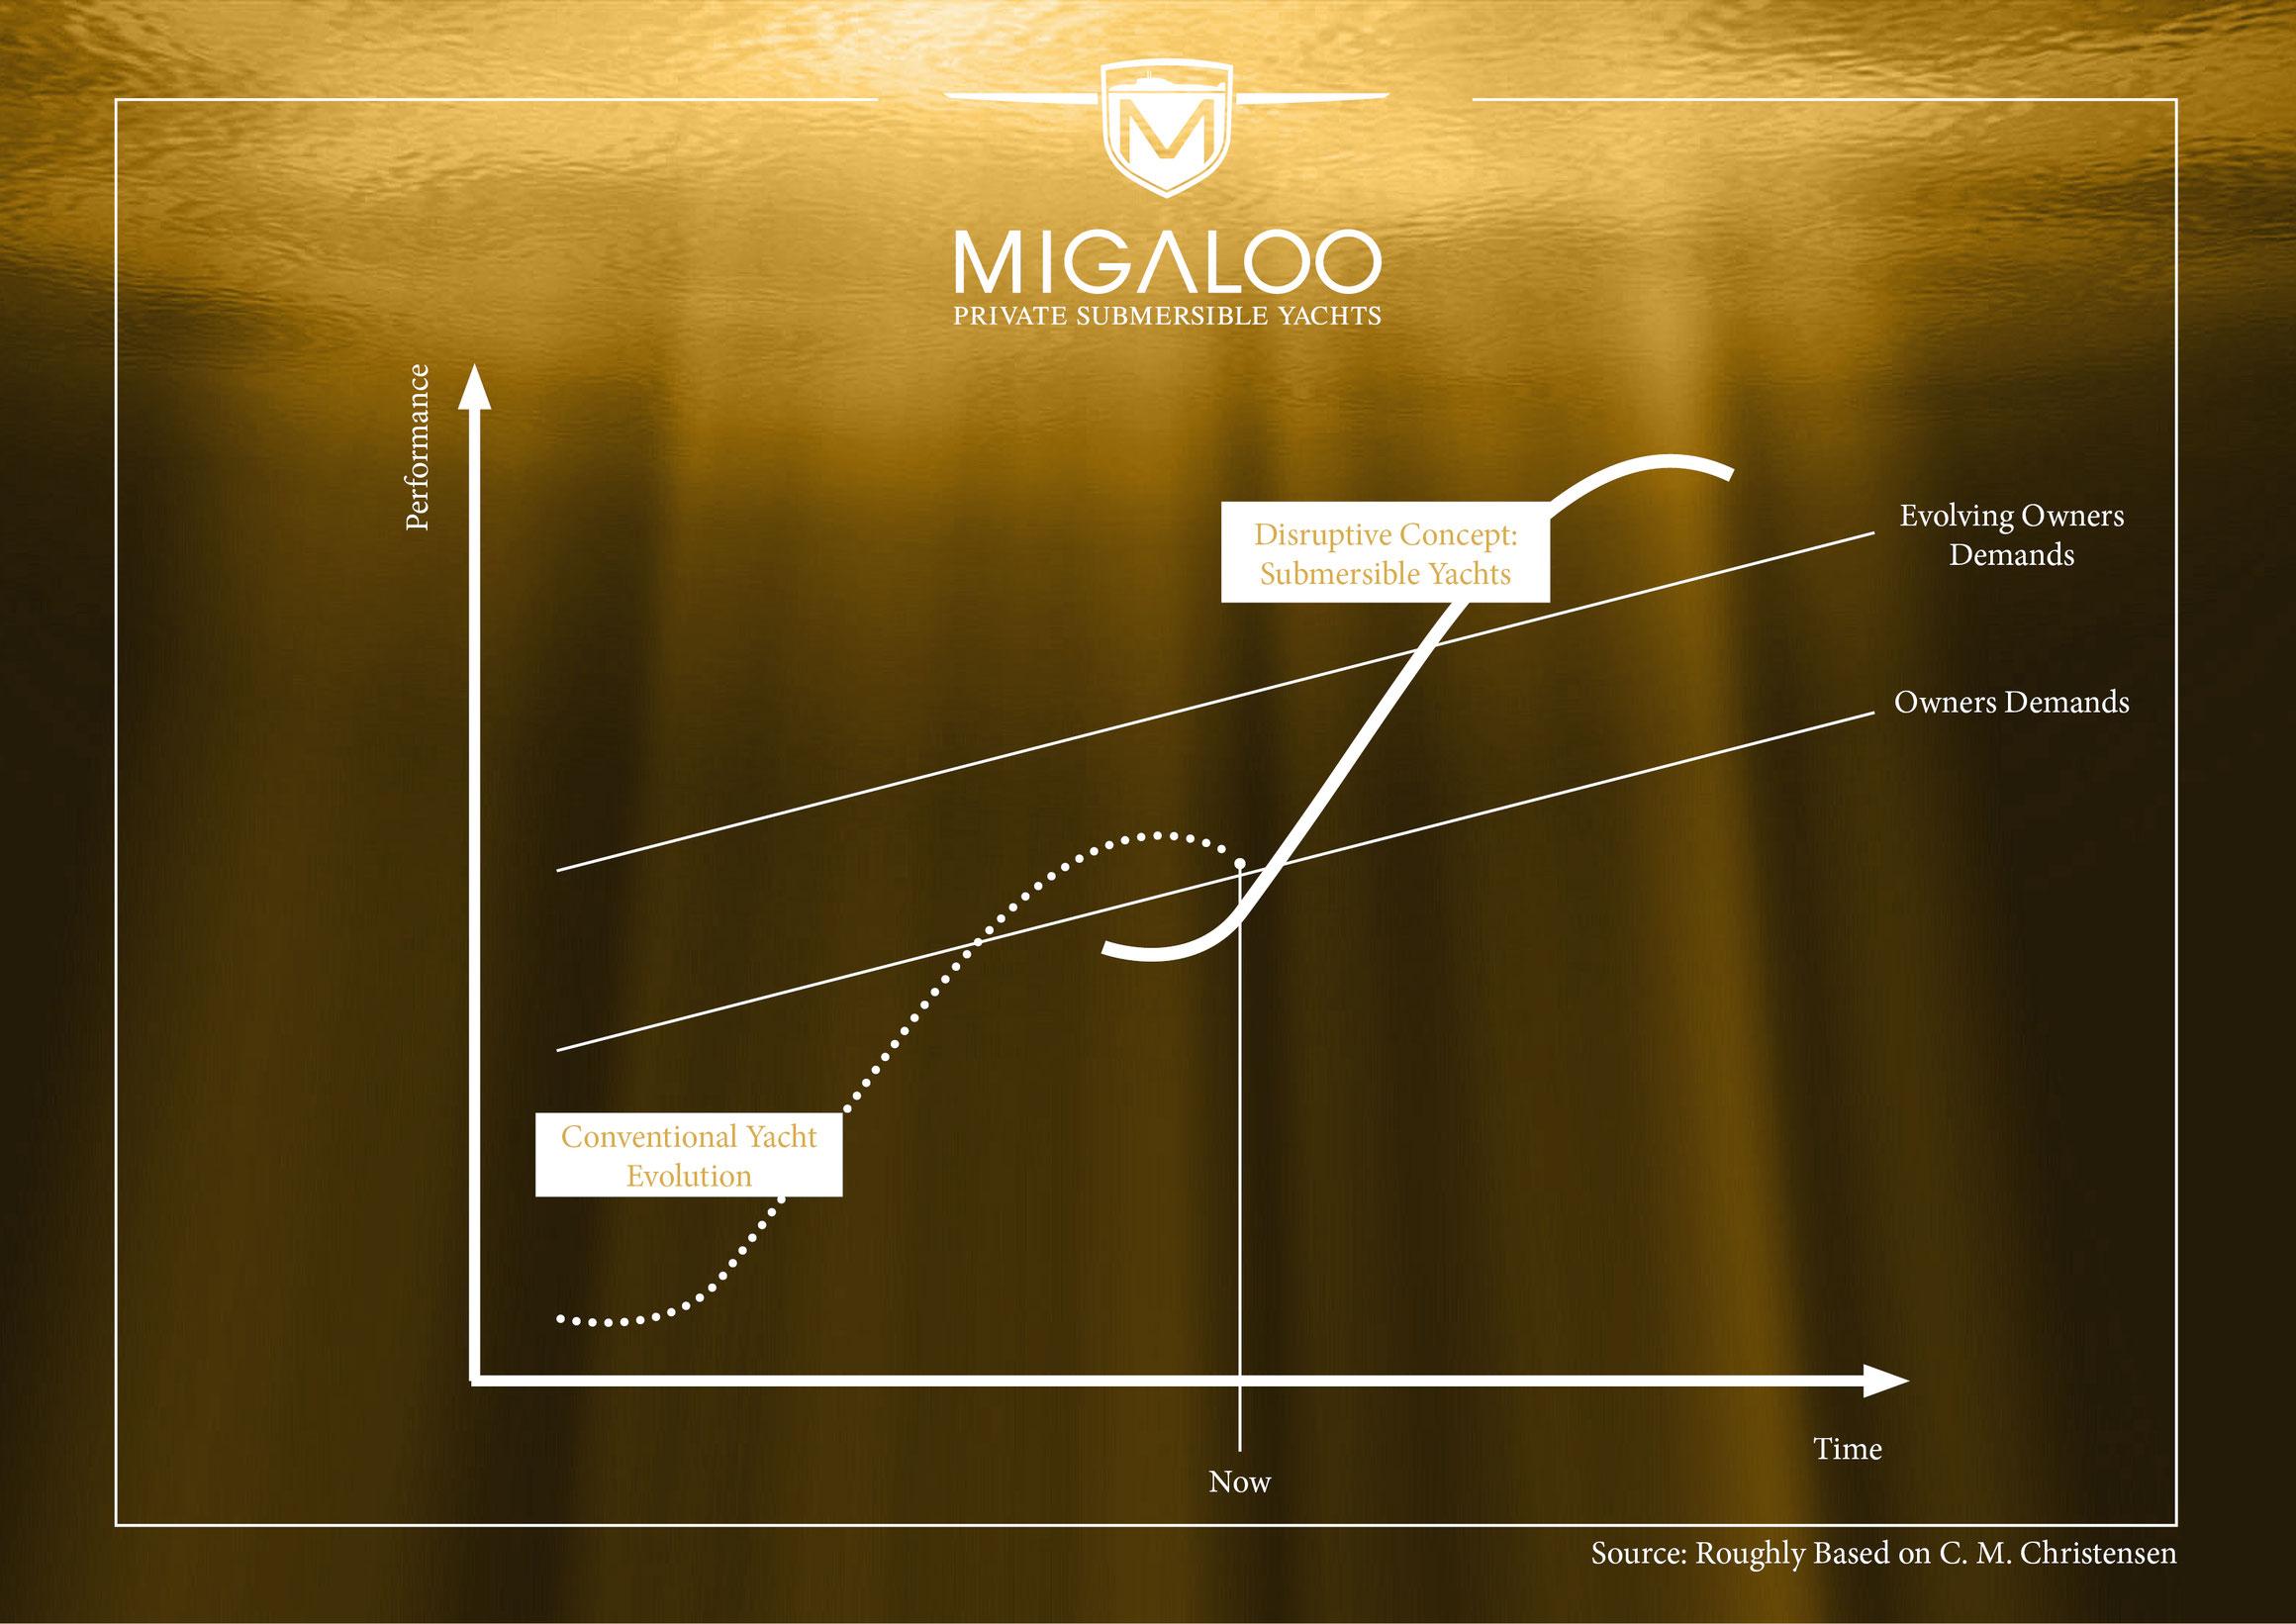 MIGALOO - MIGALOO Submarines